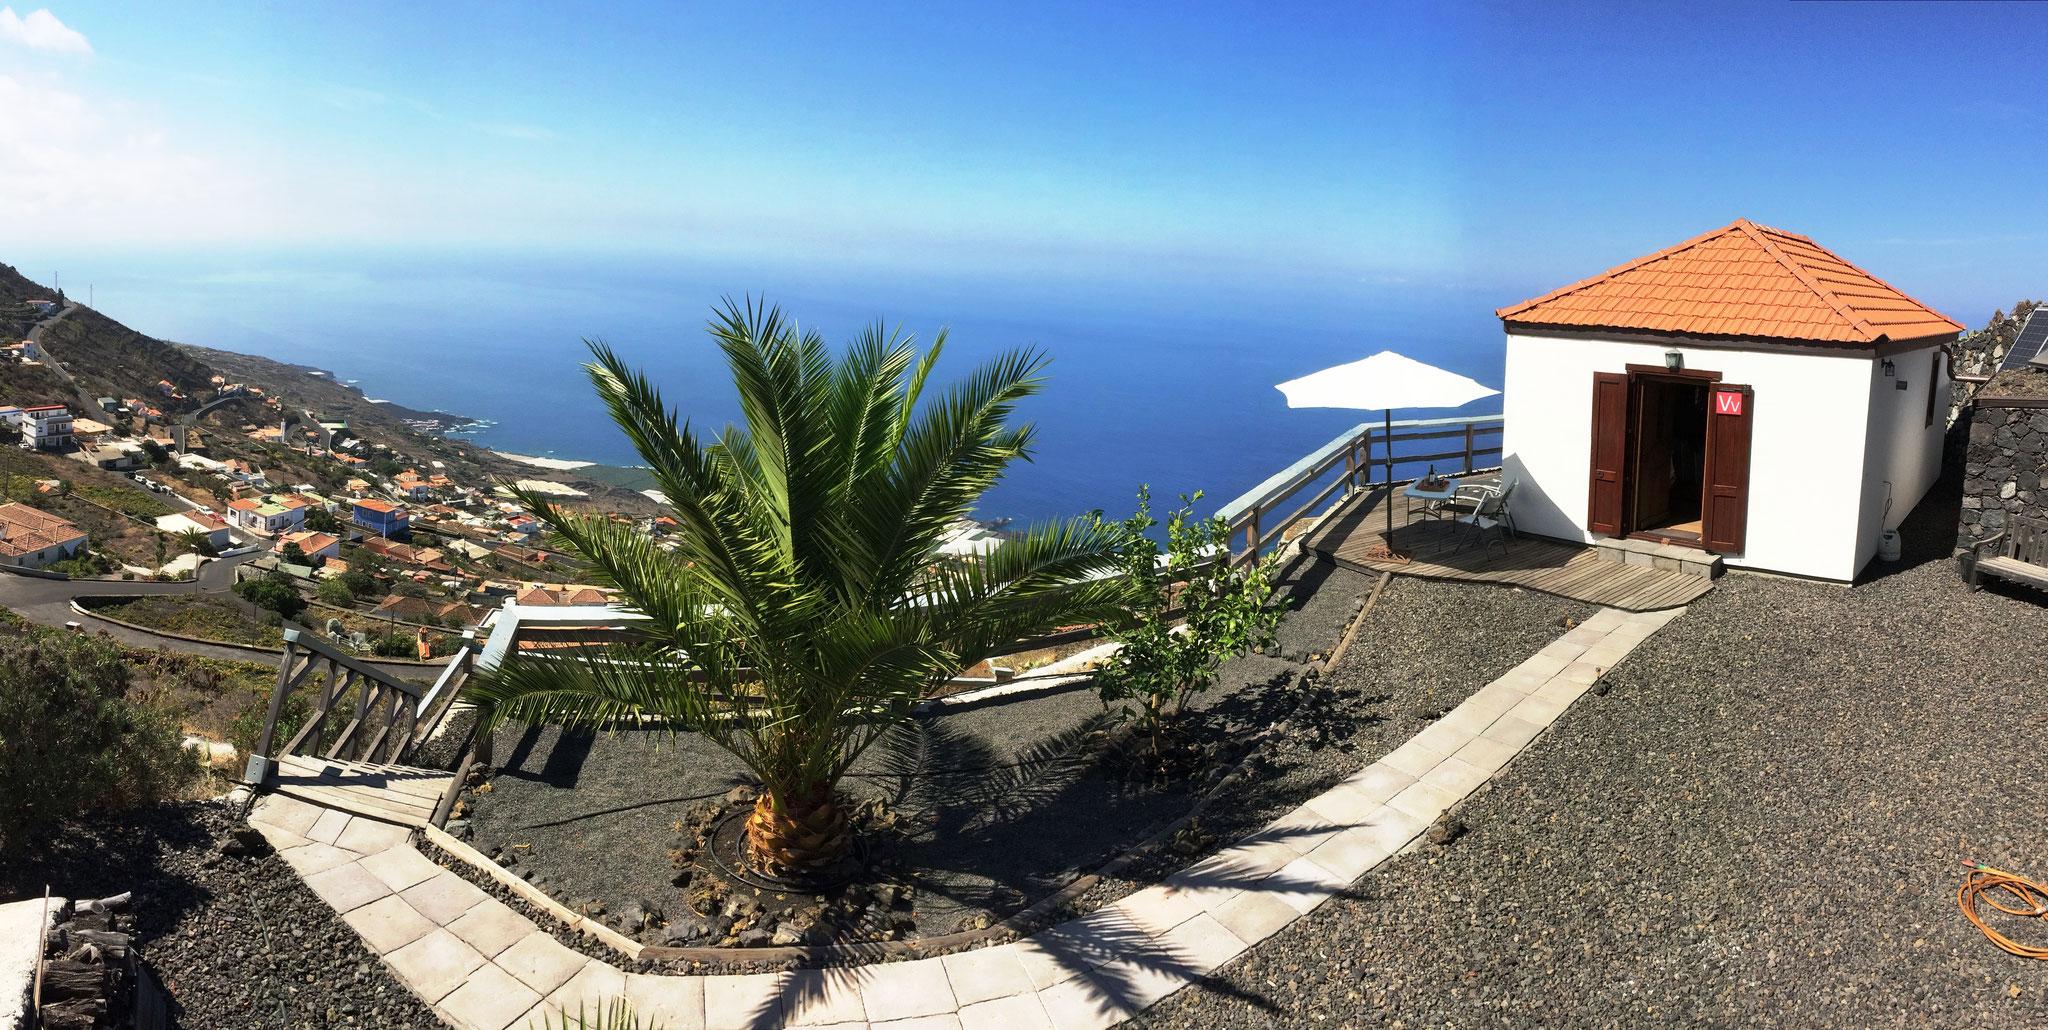 Casa Mirador - Hausansicht Panorama - Las Indias - La Palma